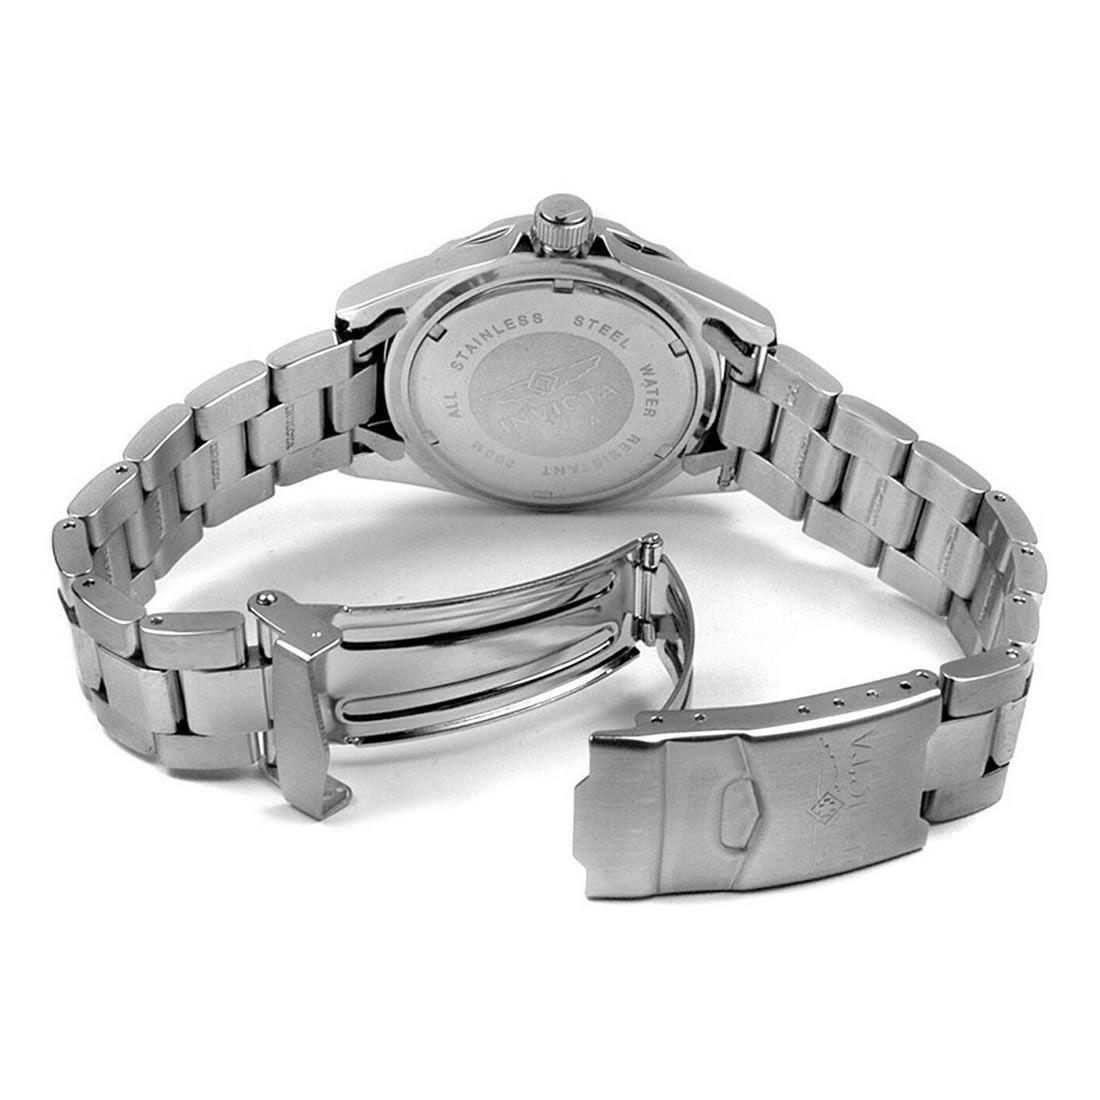 Relógio Masculino Pro Dive Modelo 8932 Aço Inoxidável